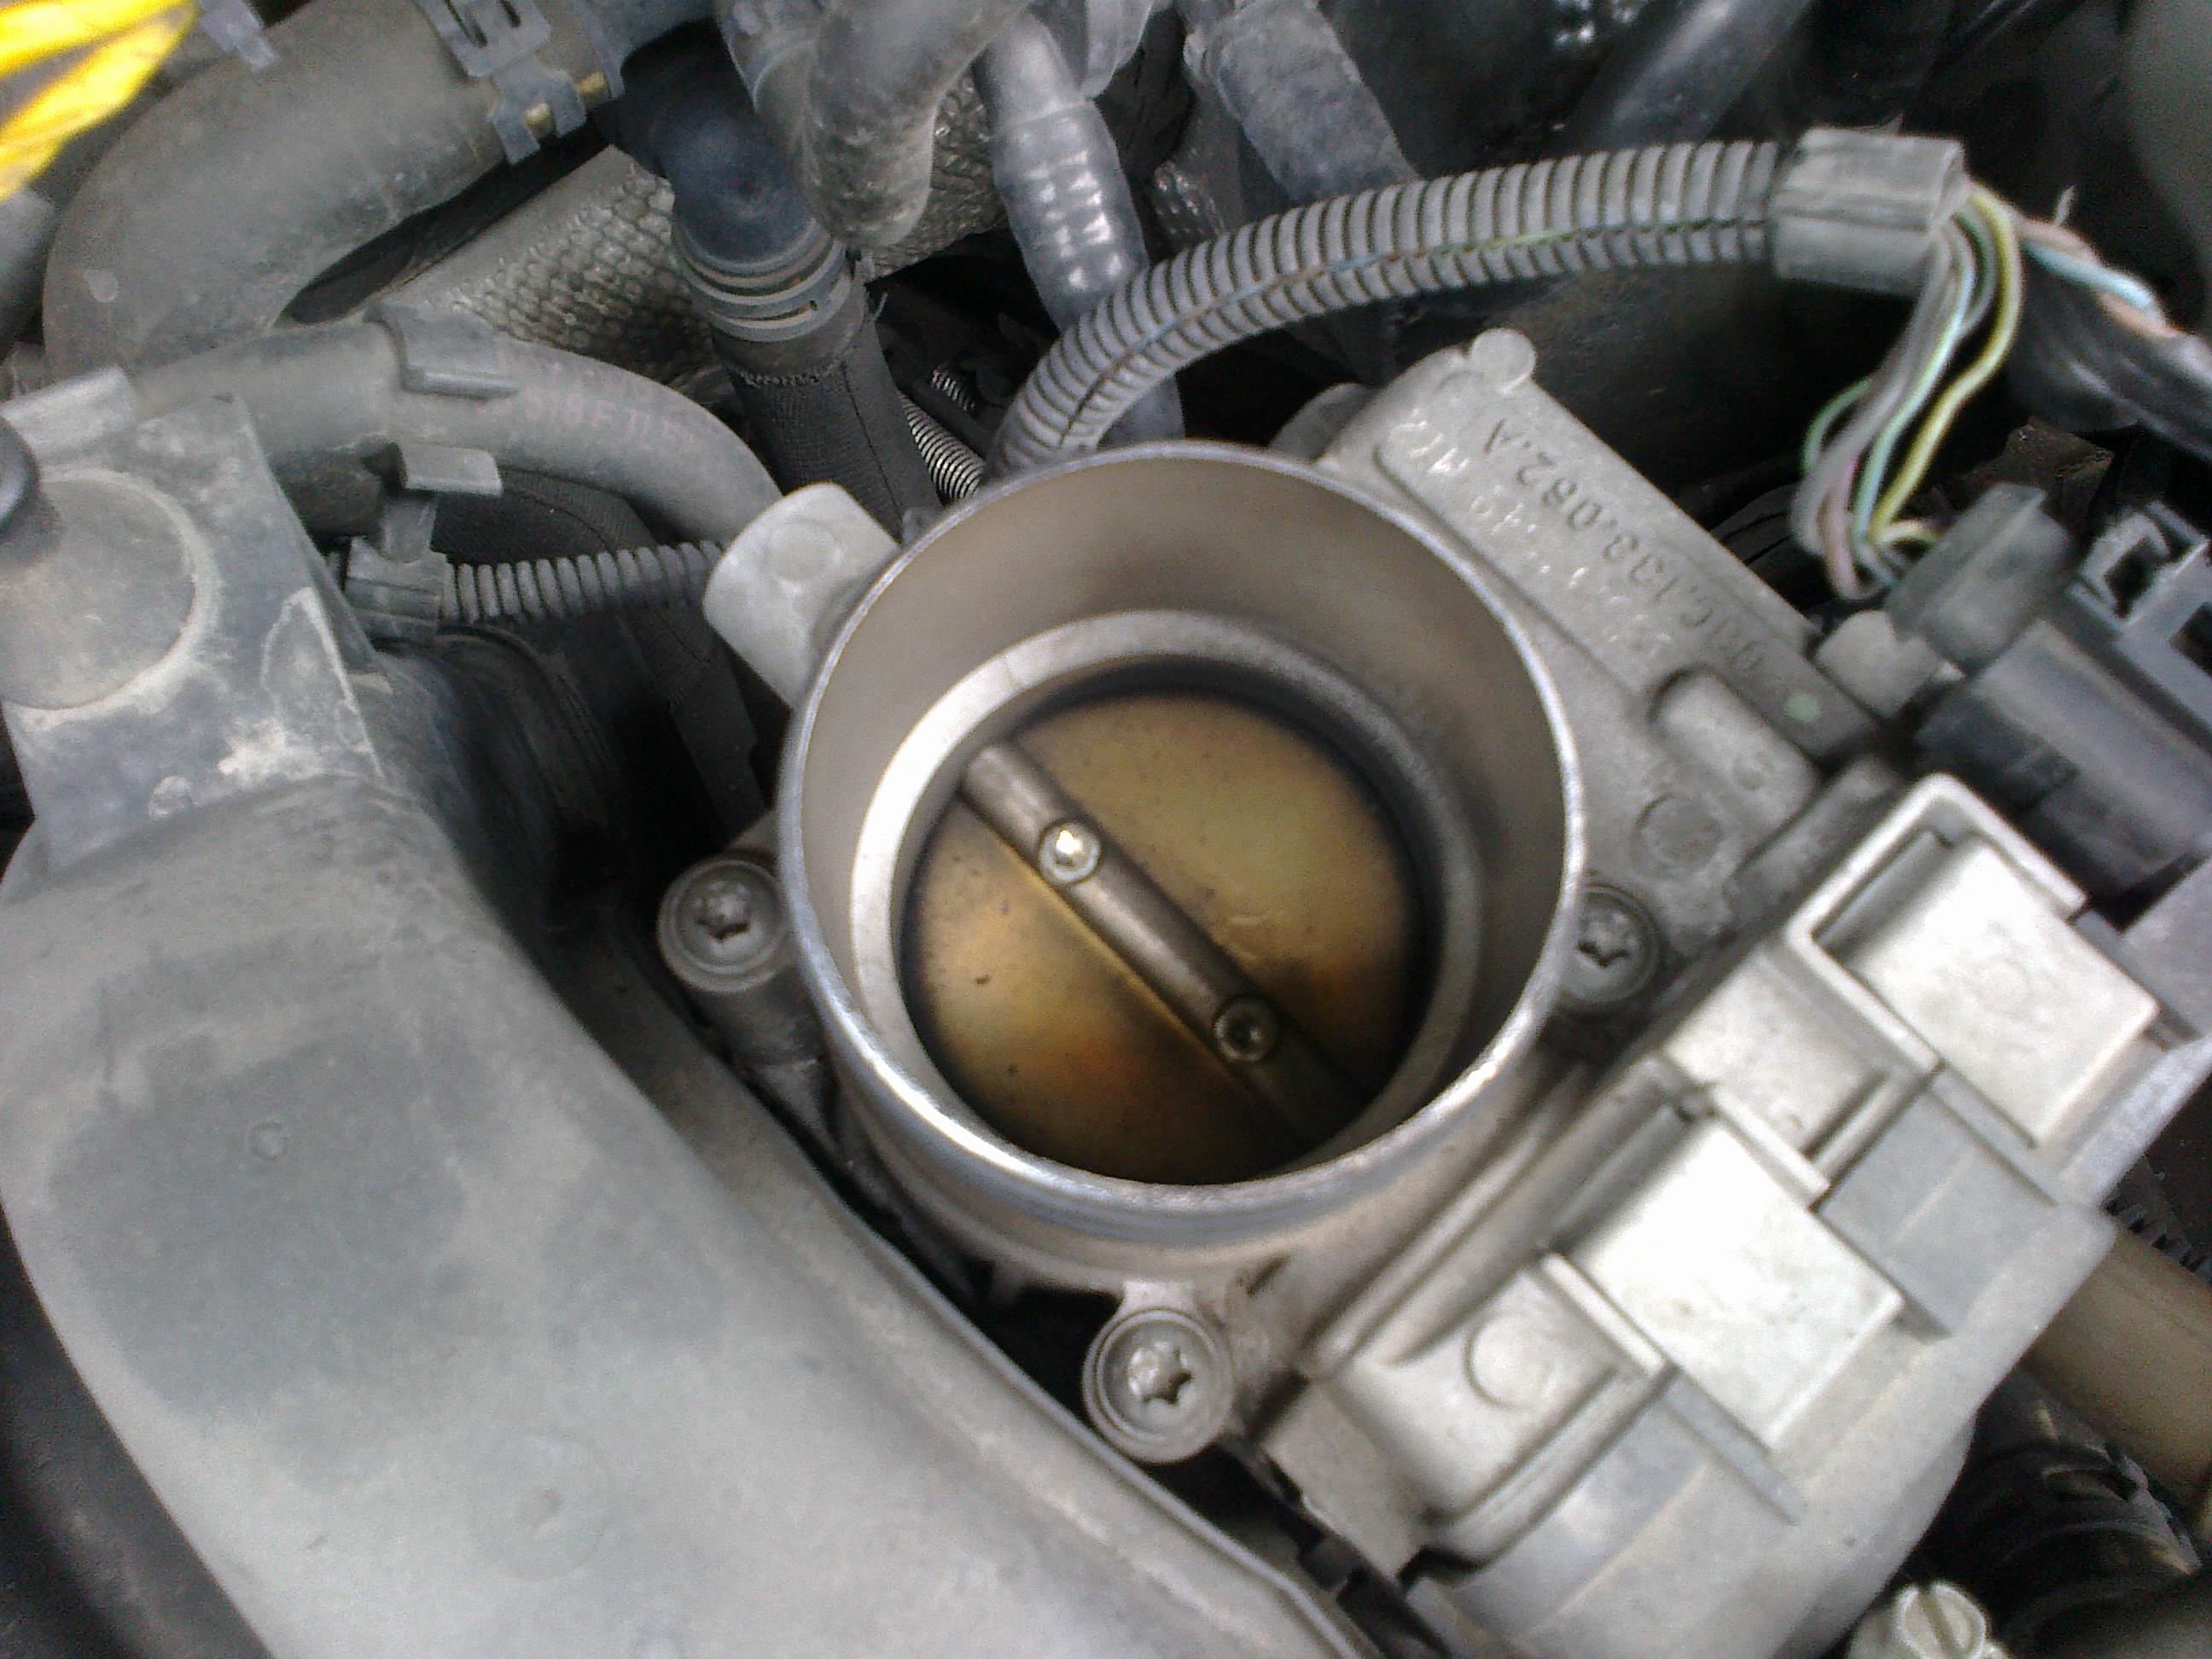 VW Golf V 1 6 FSI - Problem with the NOx sensor and the engine